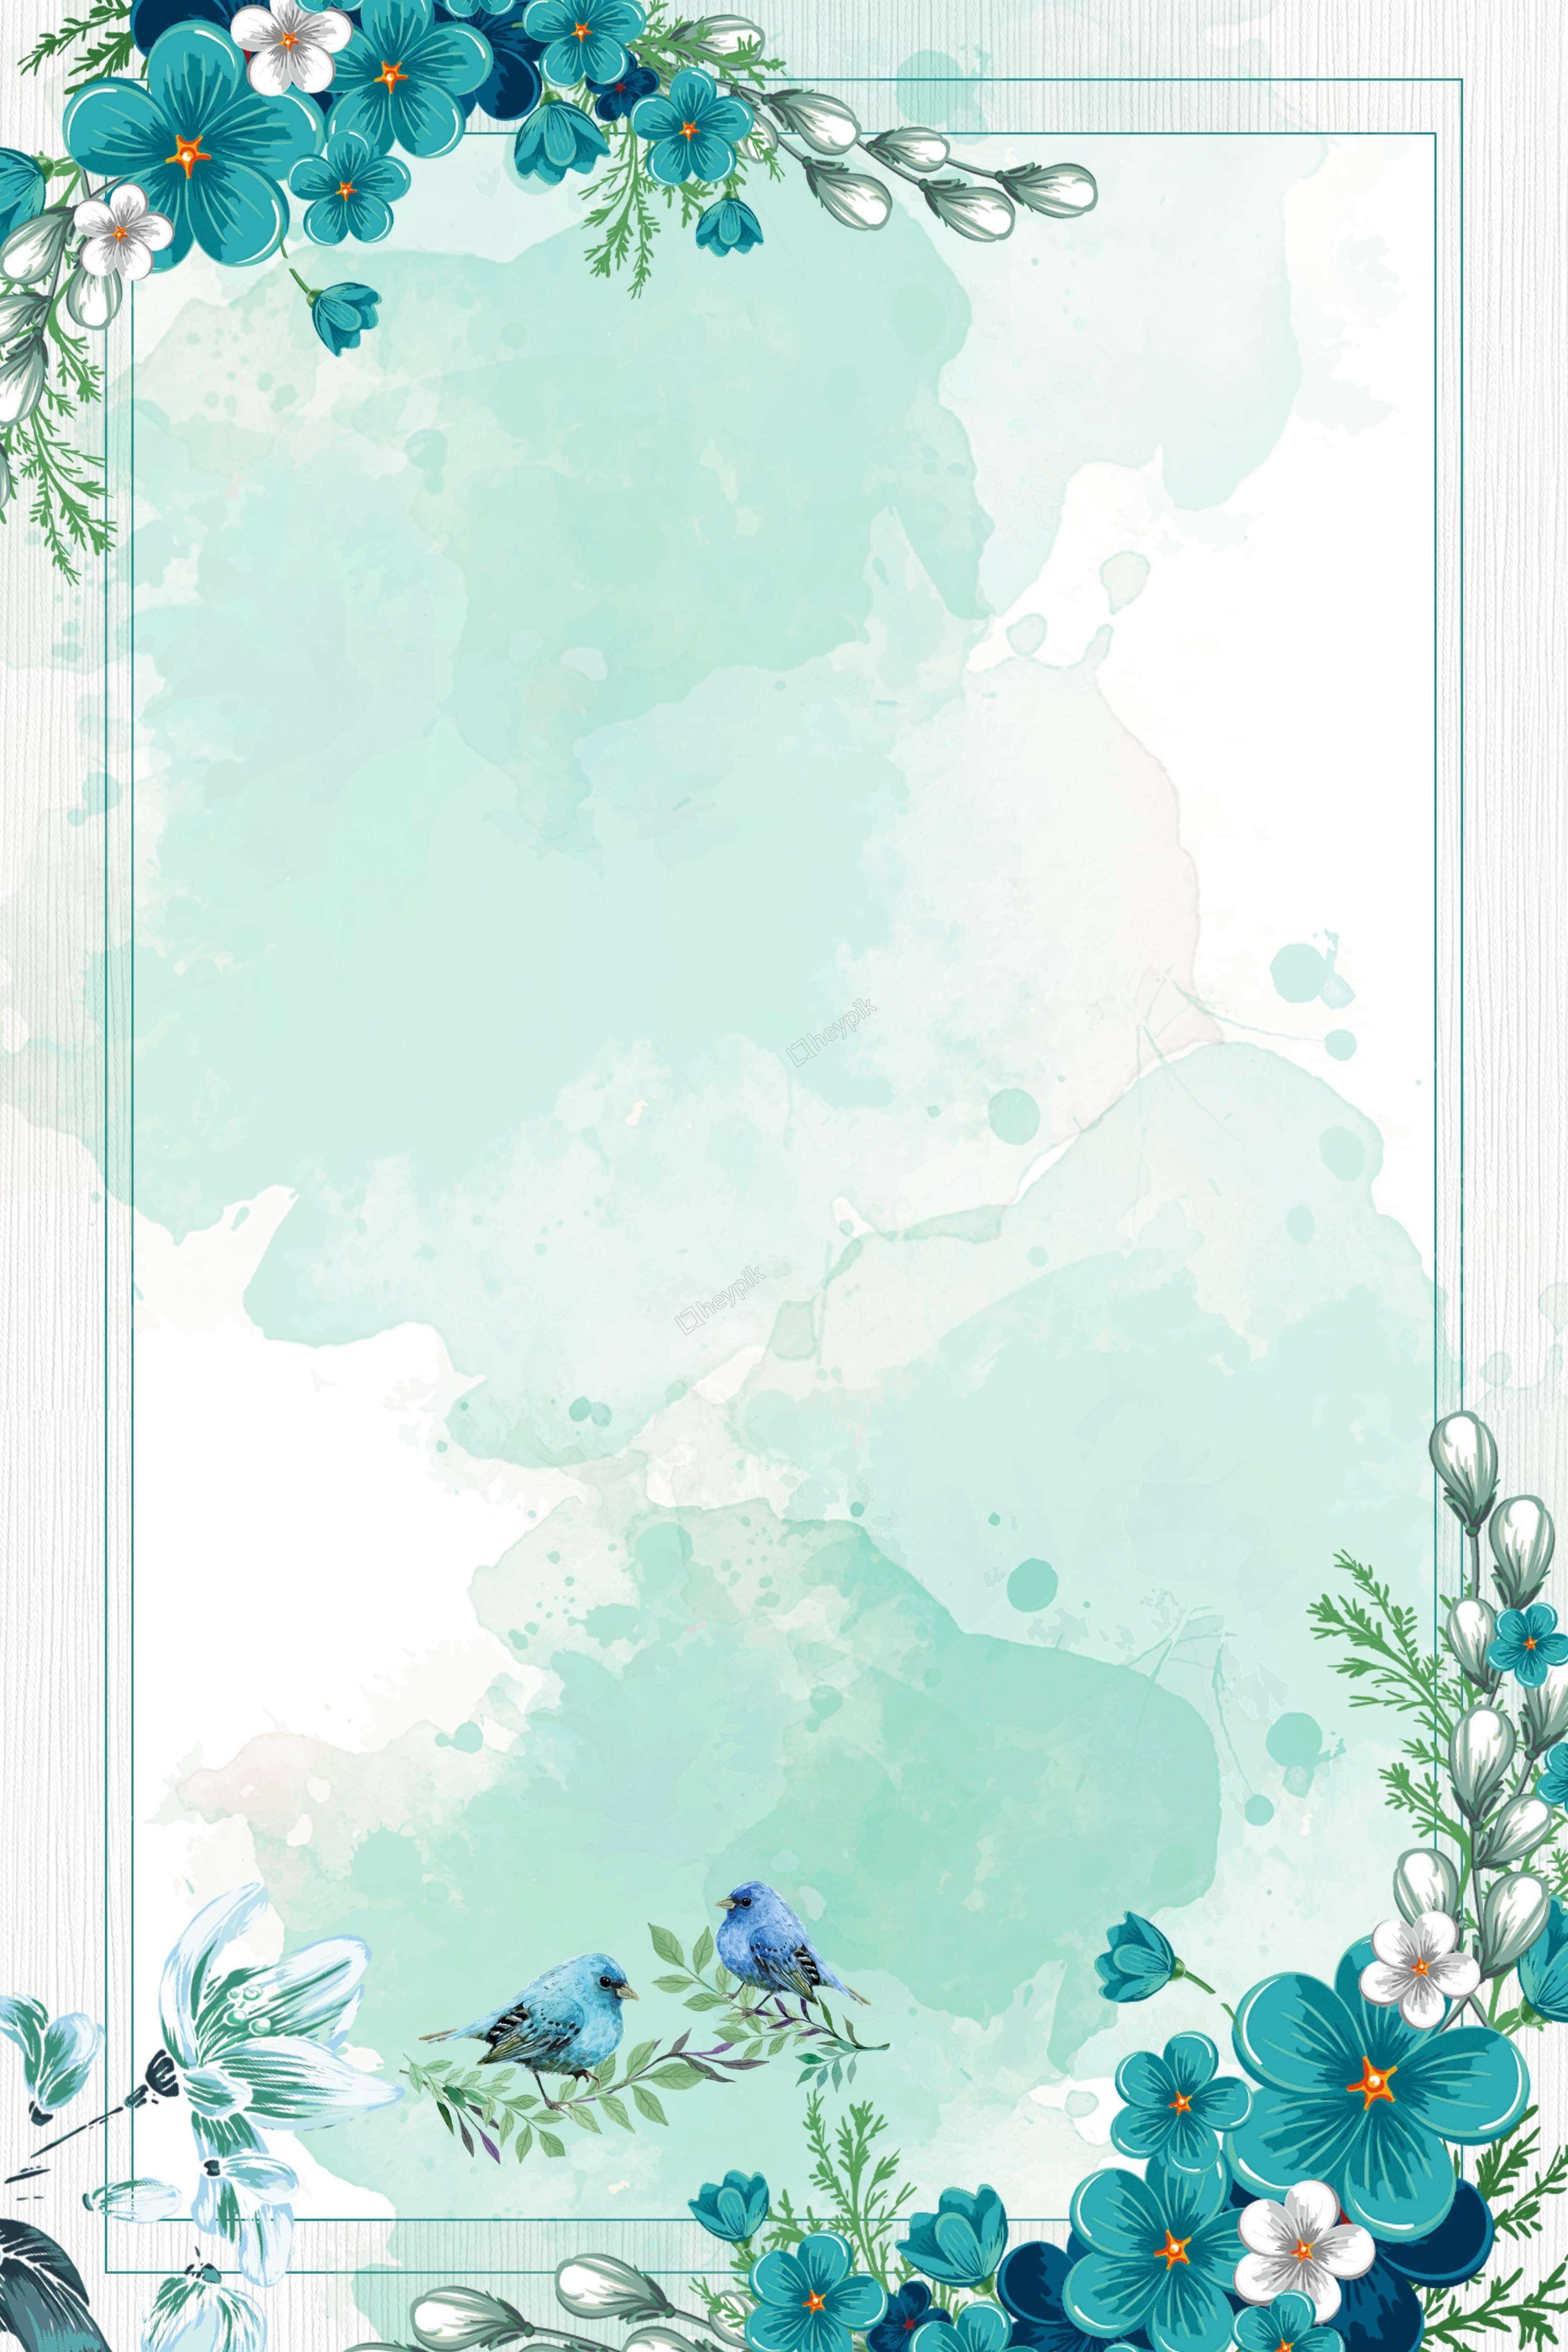 Border Background - WallpaperSafari